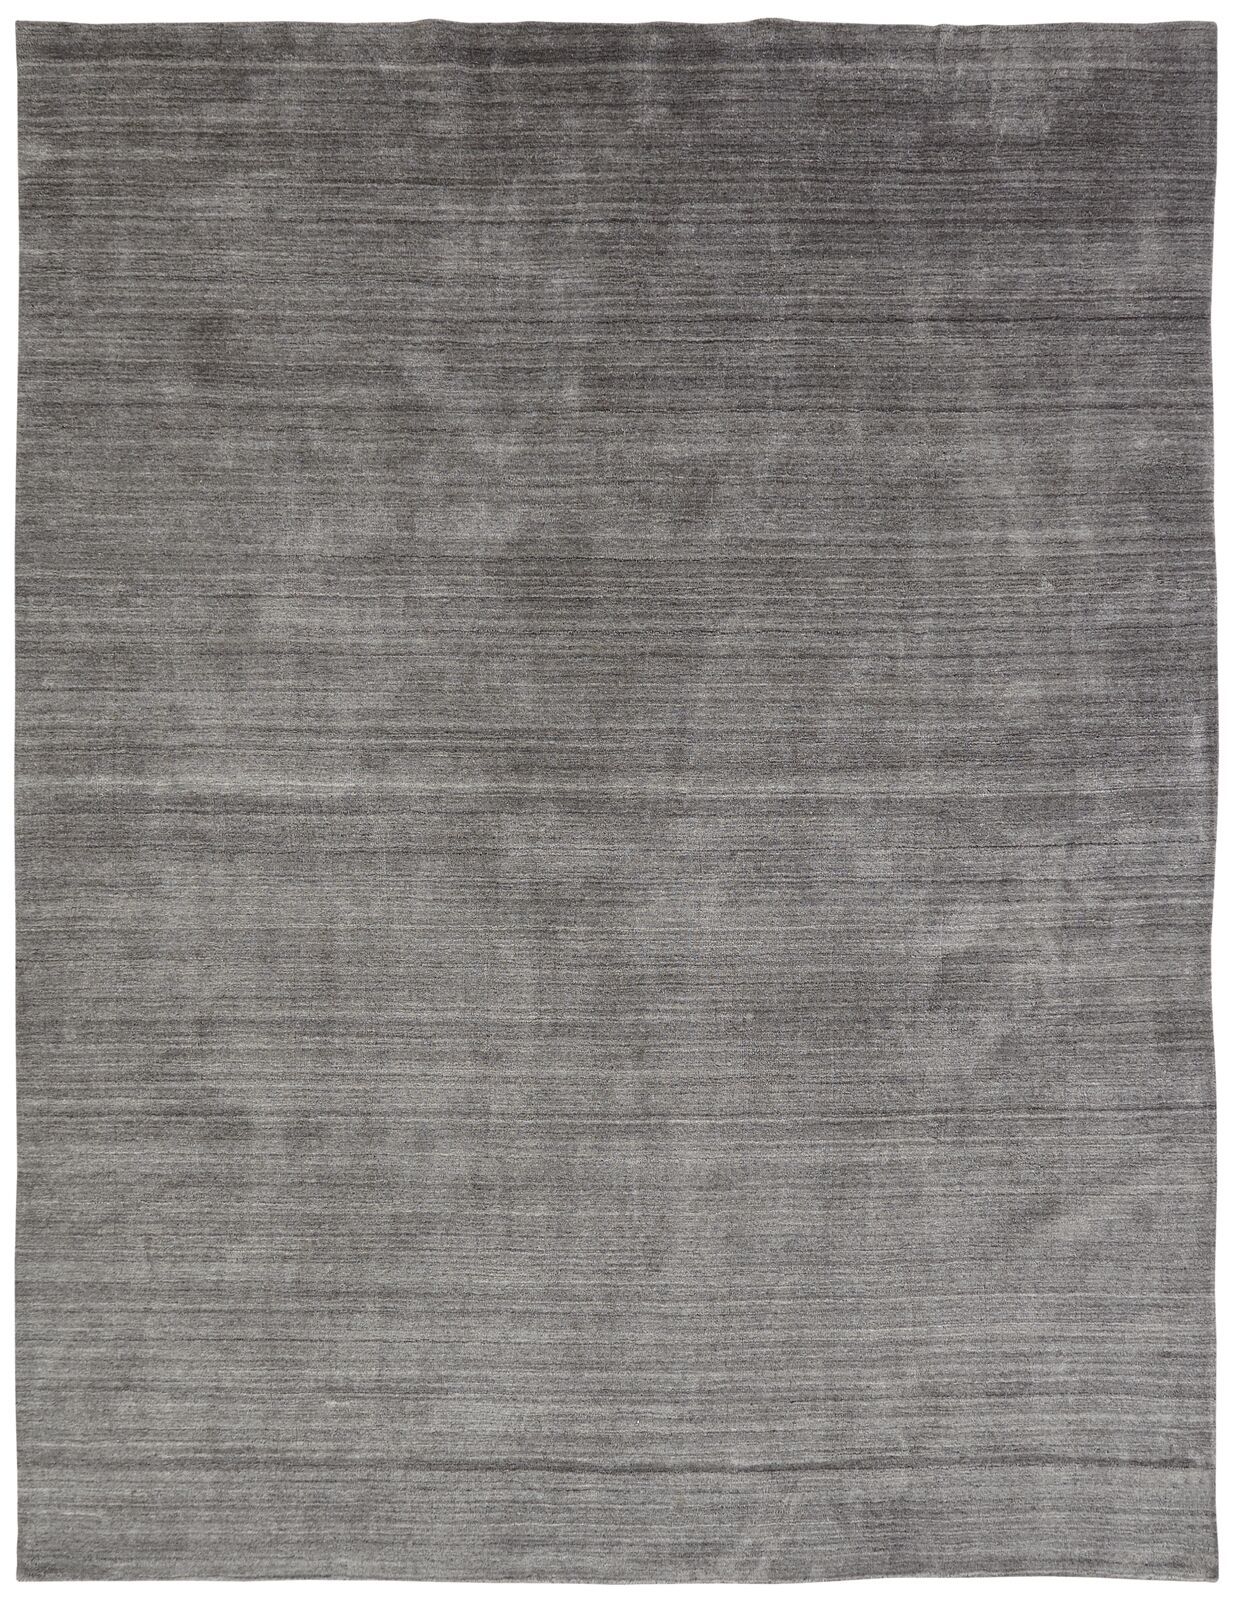 Jami Hand-Woven Area Rug Rug Size: 7'6